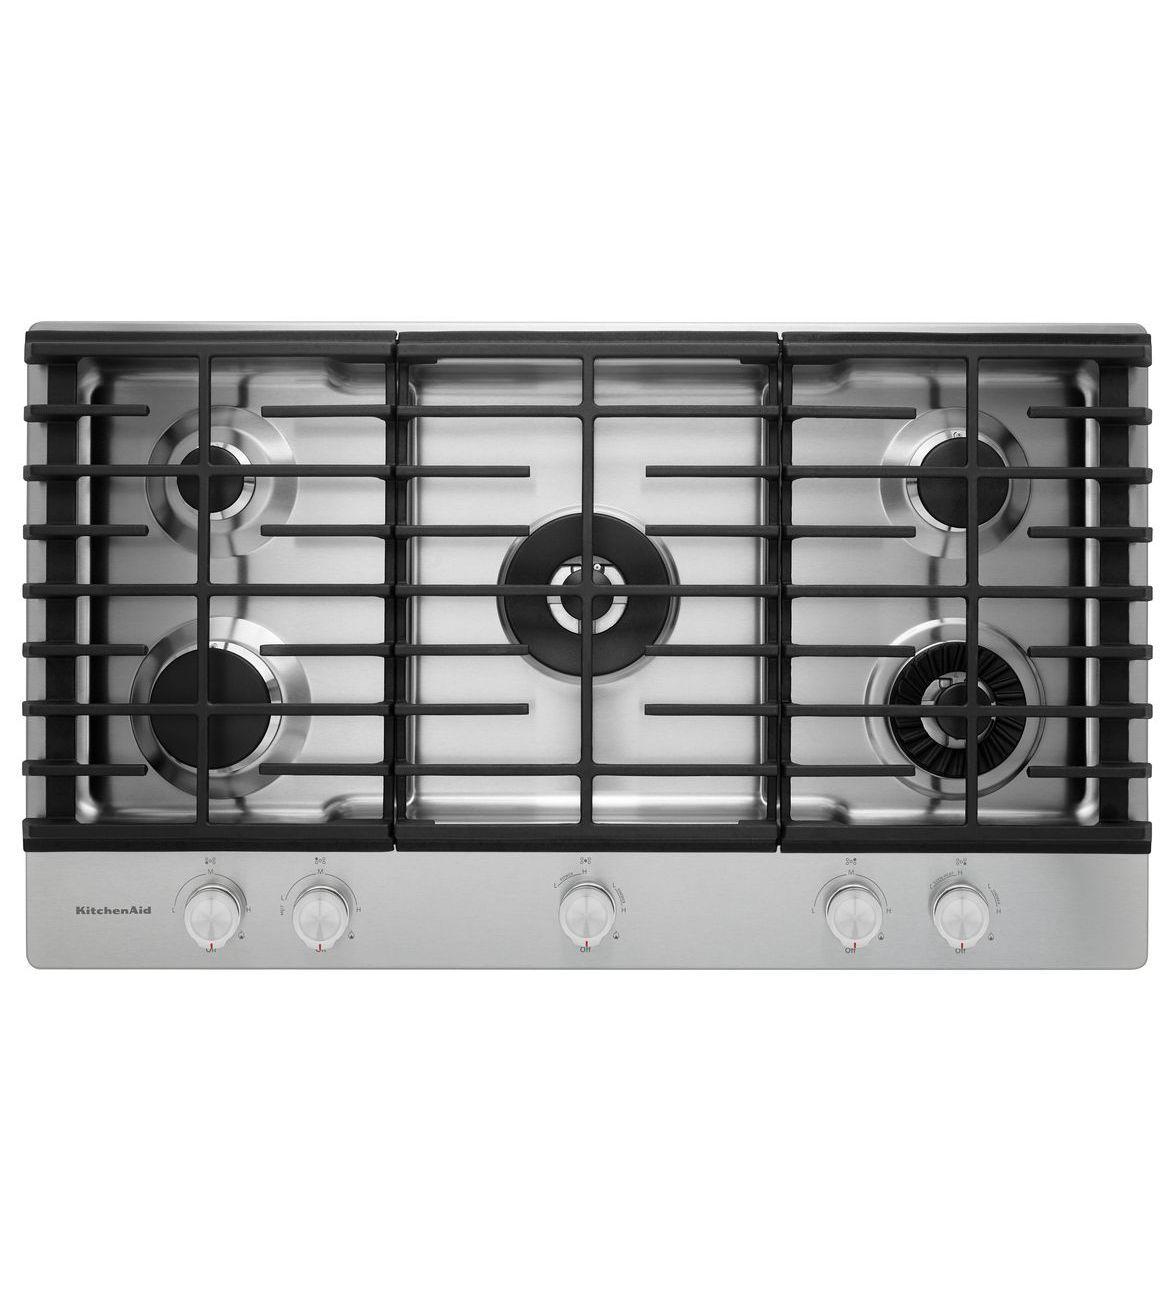 Stainless Steel 36 5 Burner Gas Cooktop Kcgs556ess Kitchenaid Gas Cooktop Cooktop Kitchen Aid